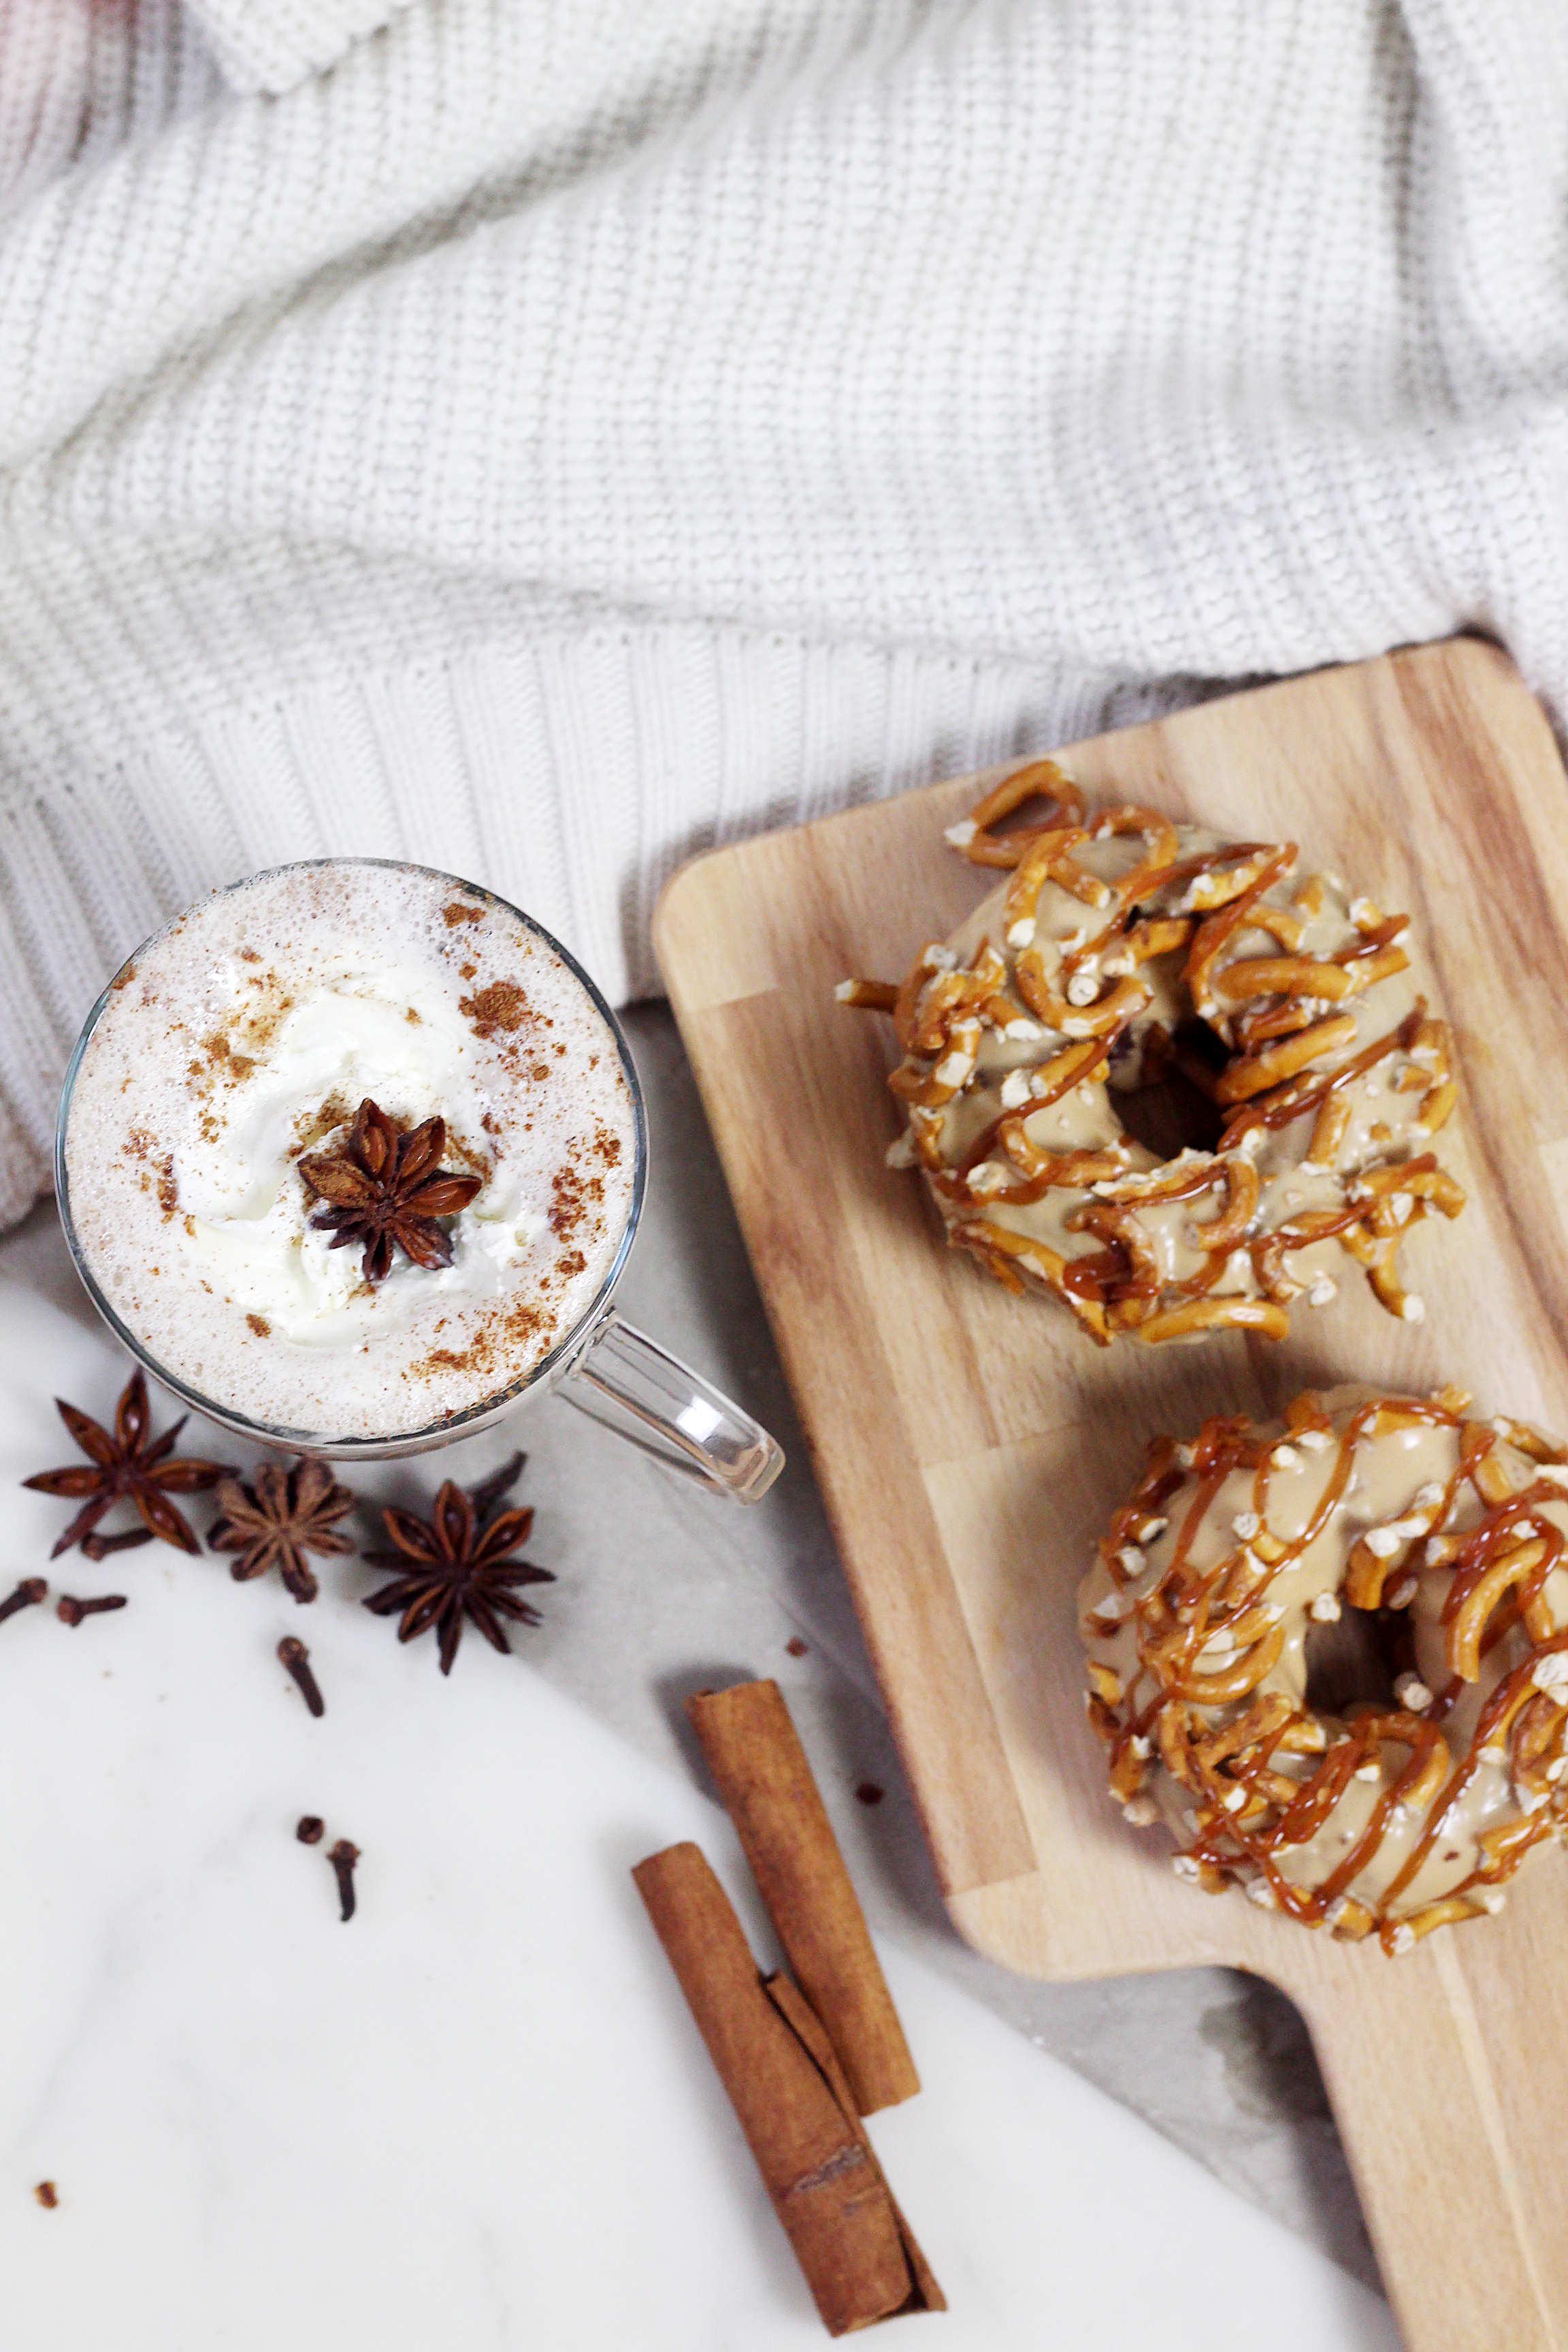 chai-latte-selber-machen-rezept-flatlay-diy-blog